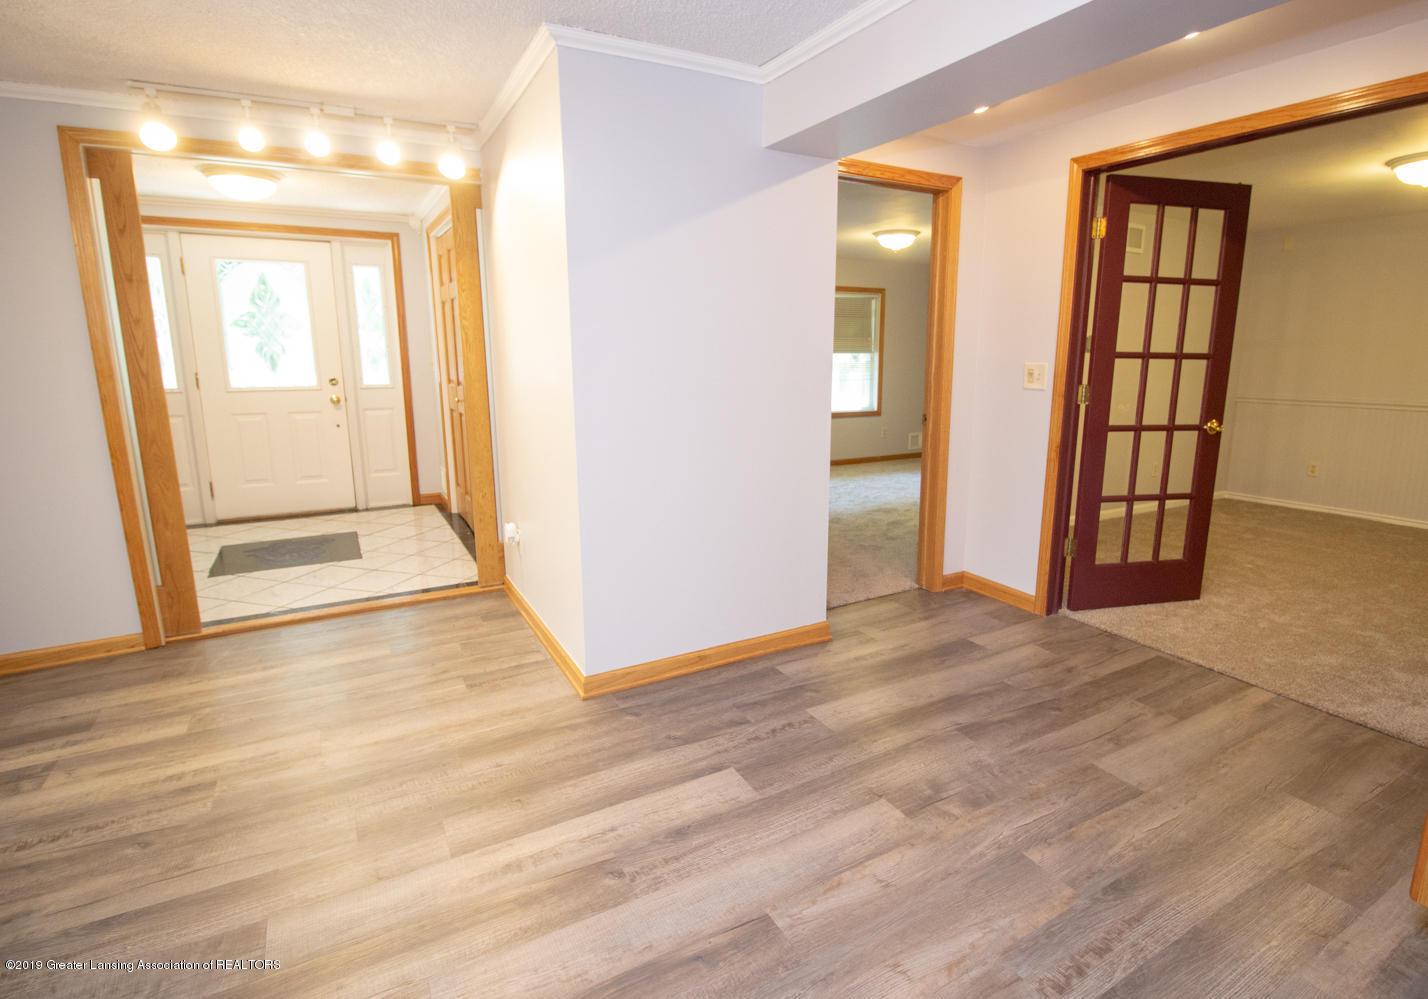 5891 Zimmer Rd - IMG_9845 - 5